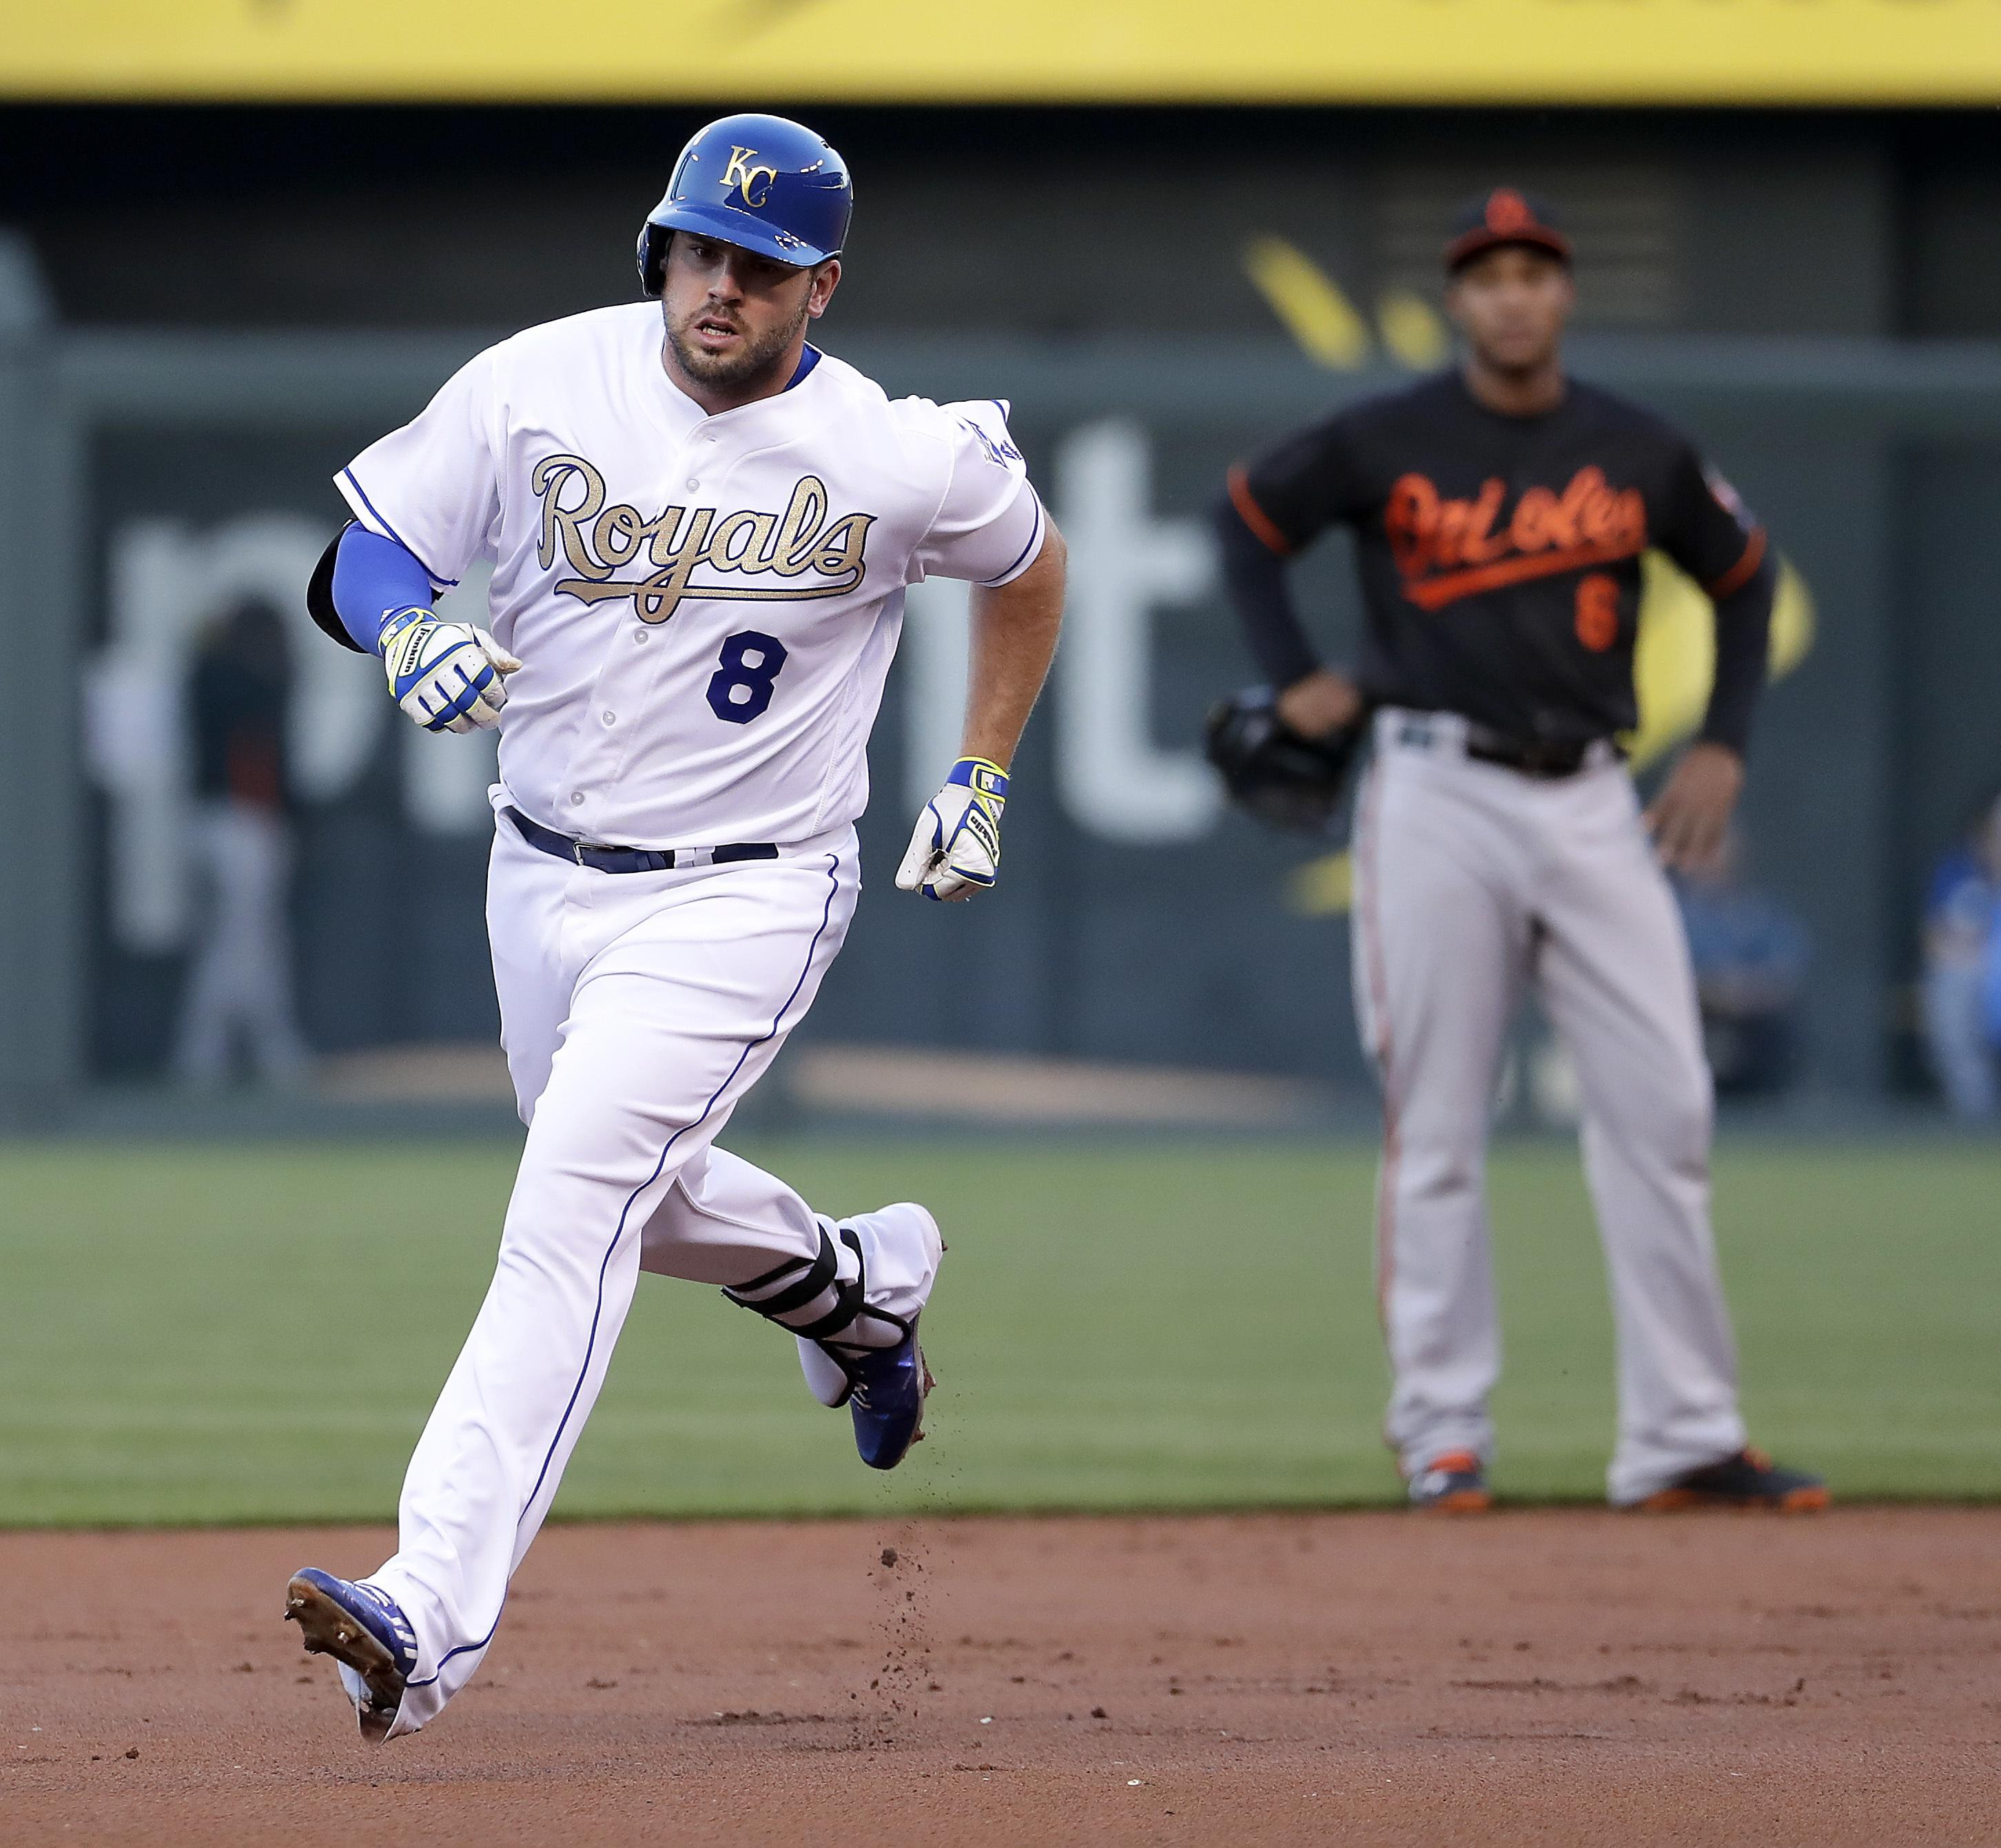 Orioles_royals_baseball